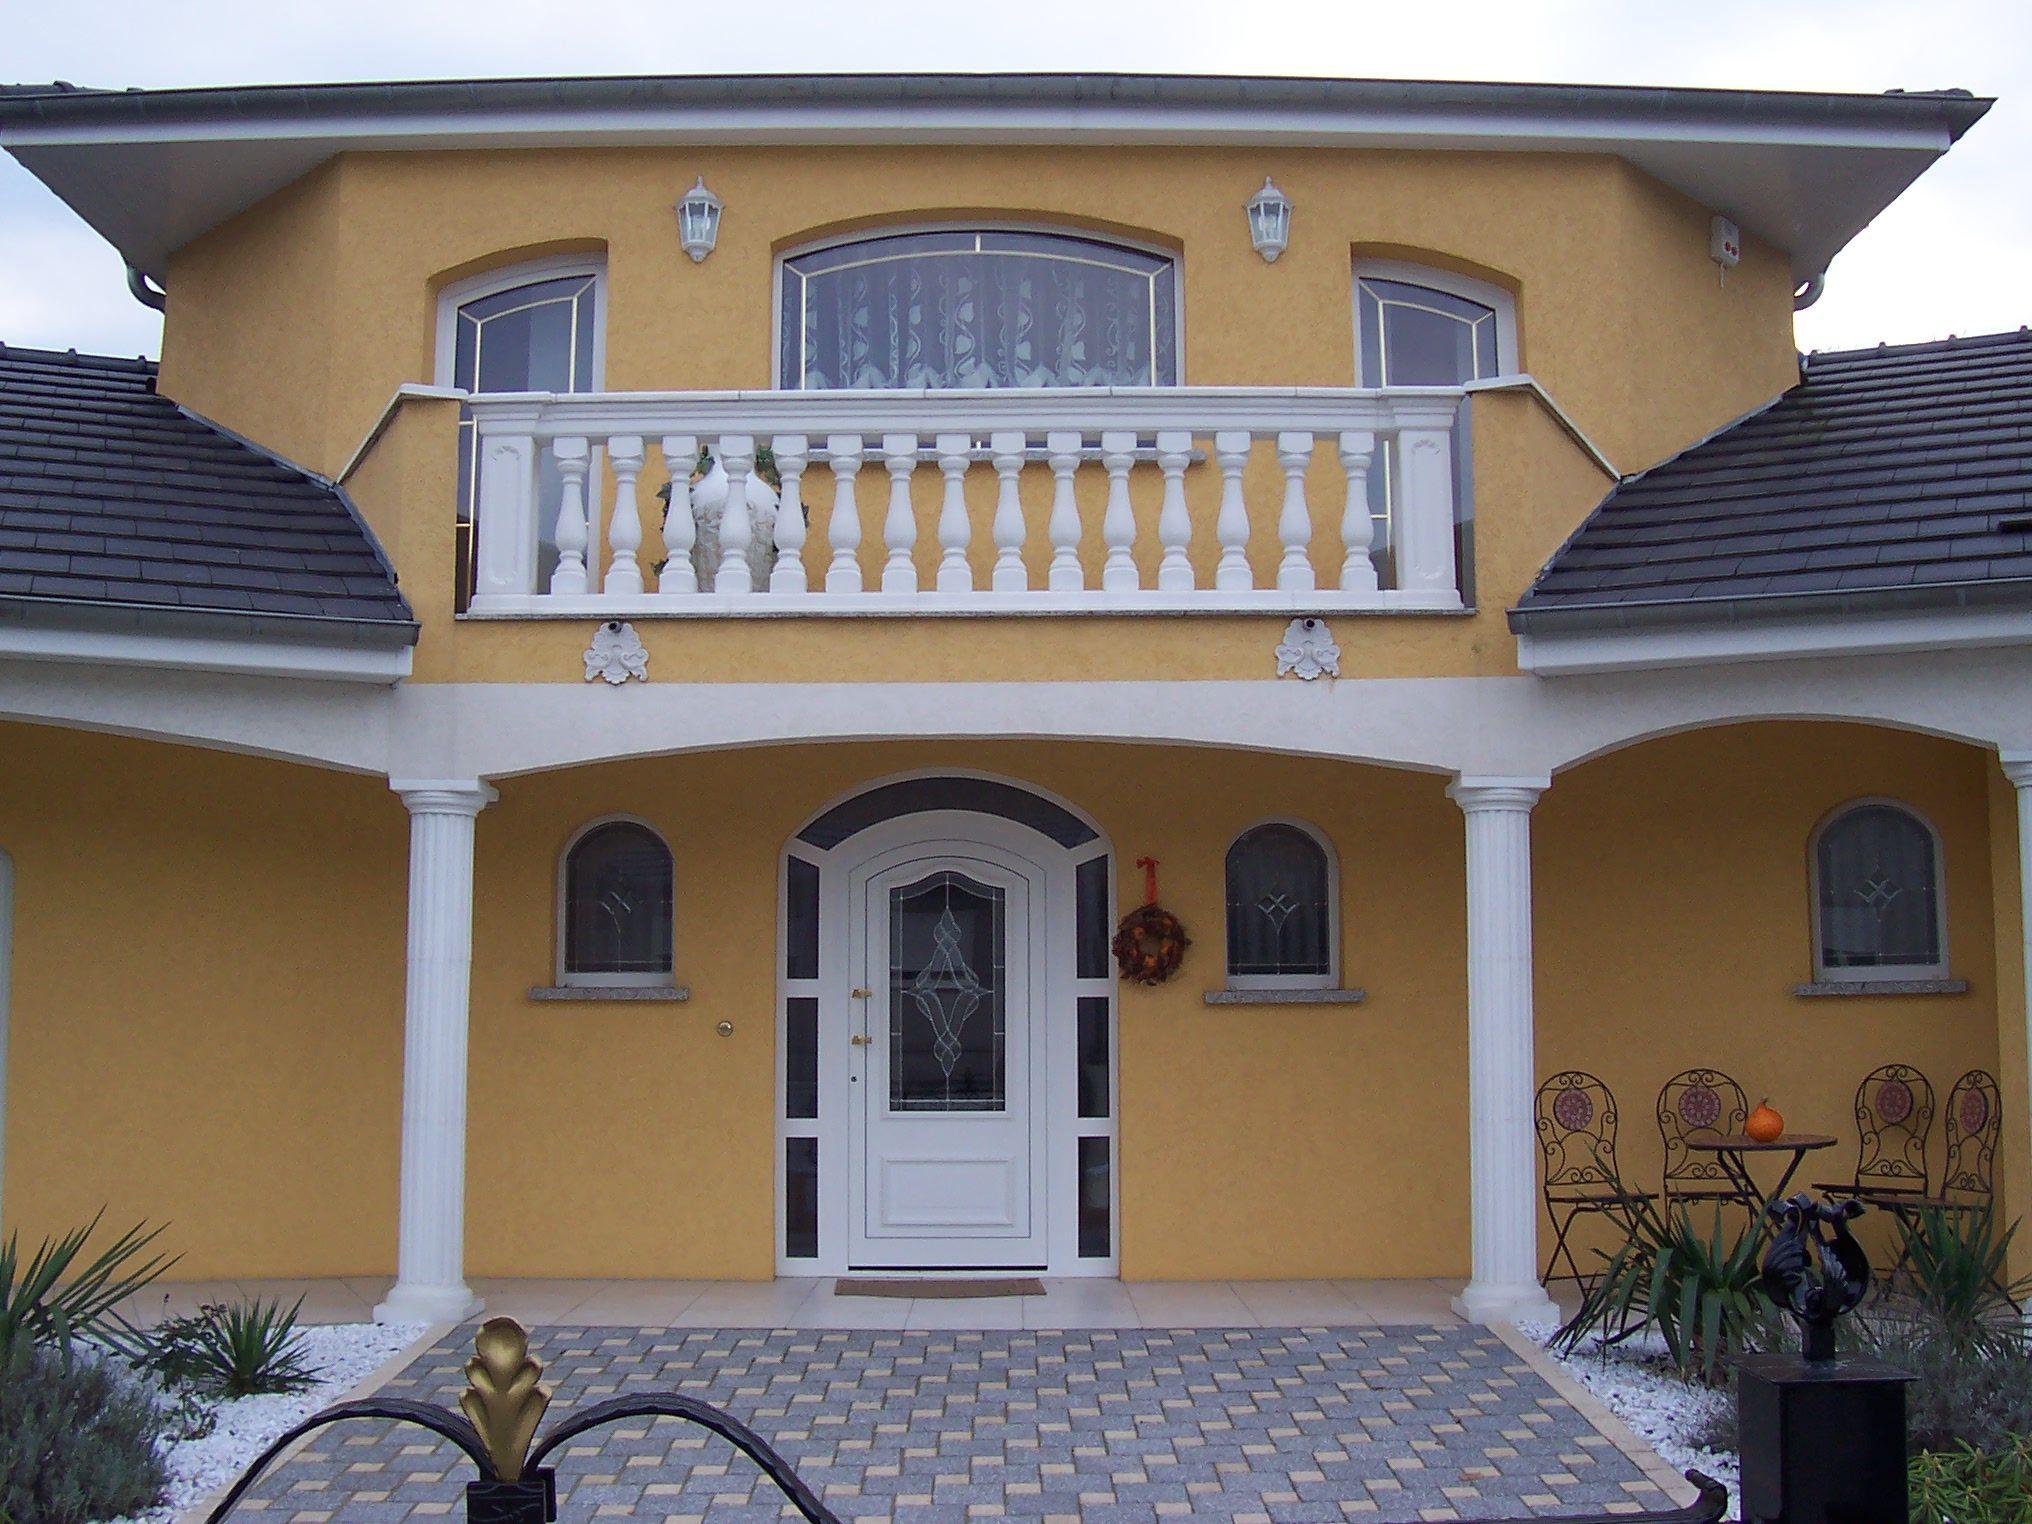 Balustrade Pour Balcon En Beton Lisse Decoratif Modele Roma Azur